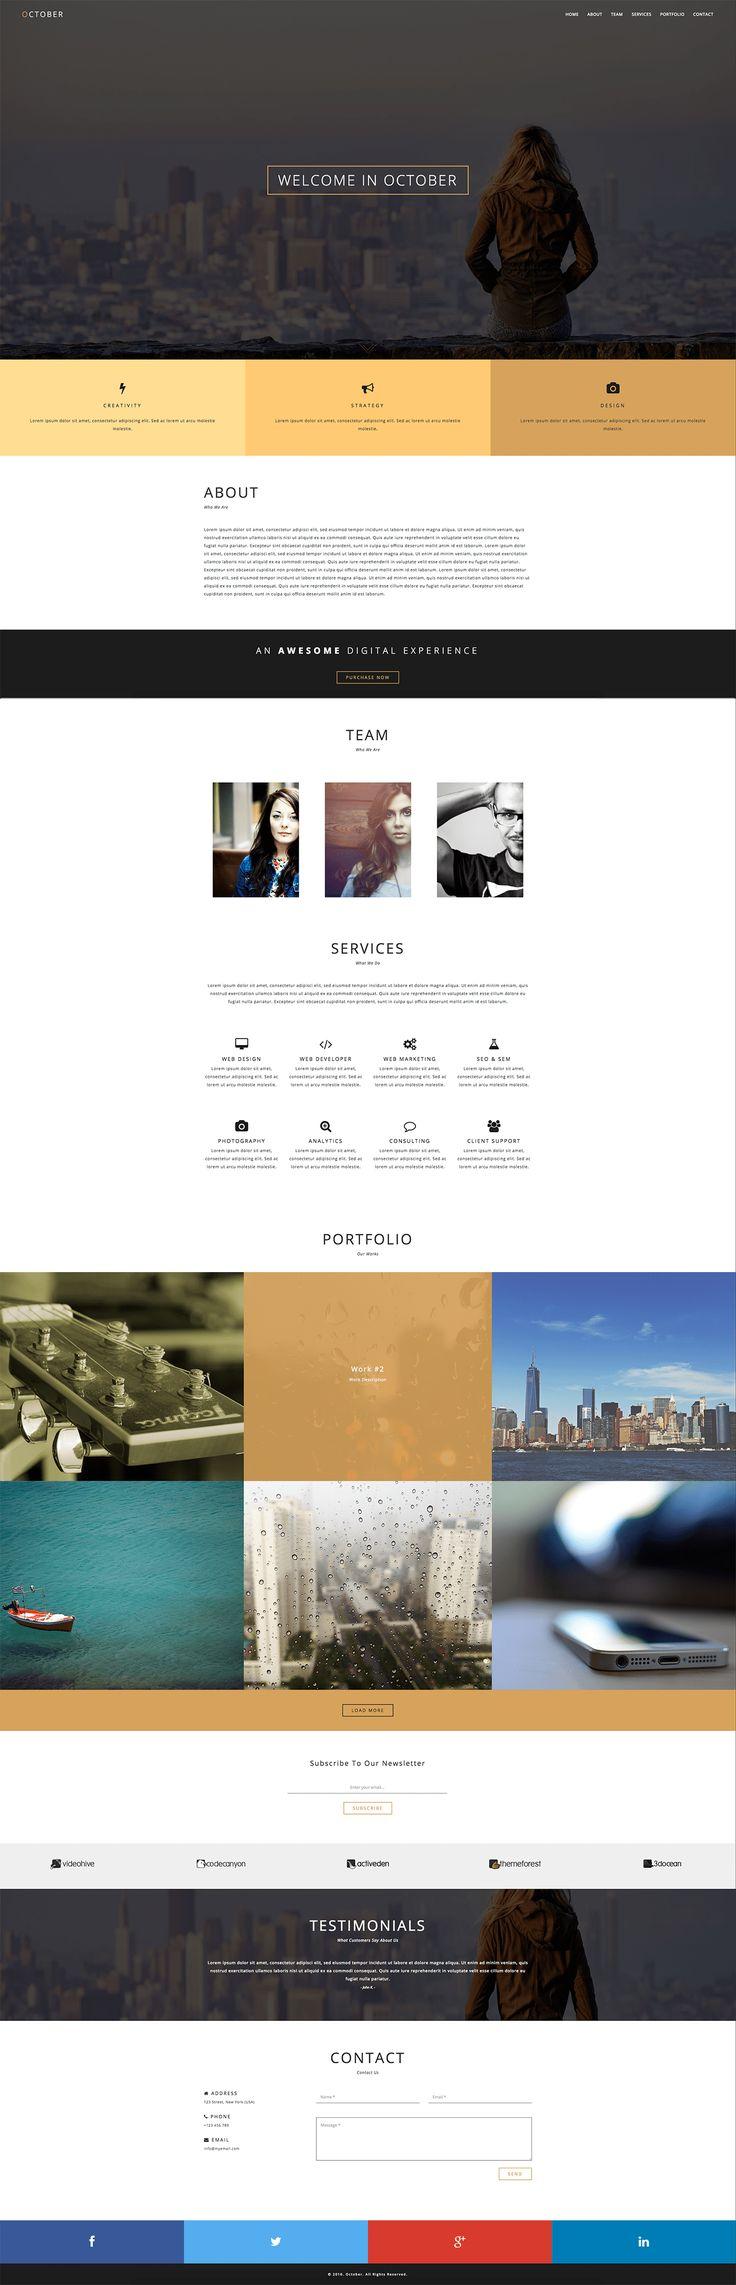 Vedi il mio progetto @Behance: \u201cOctober - Responsive One Page HTML Template\u201d https://www.behance.net/gallery/44371505/October-Responsive-One-Page-HTML-Template